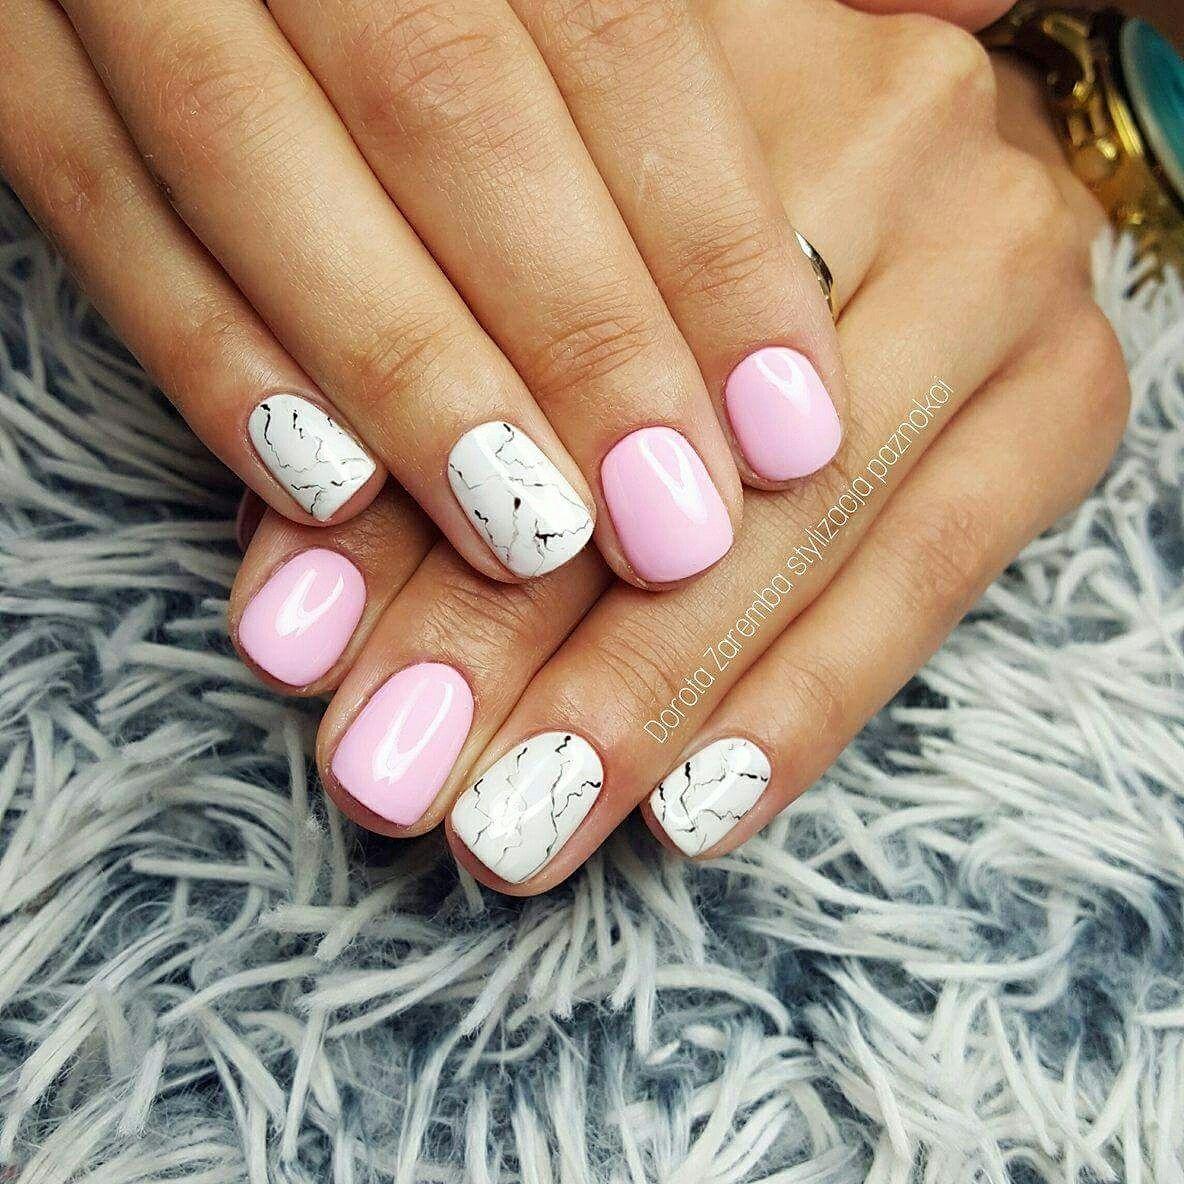 Pin by Dorota Zaremba on my passion - nails   Nails, Beauty